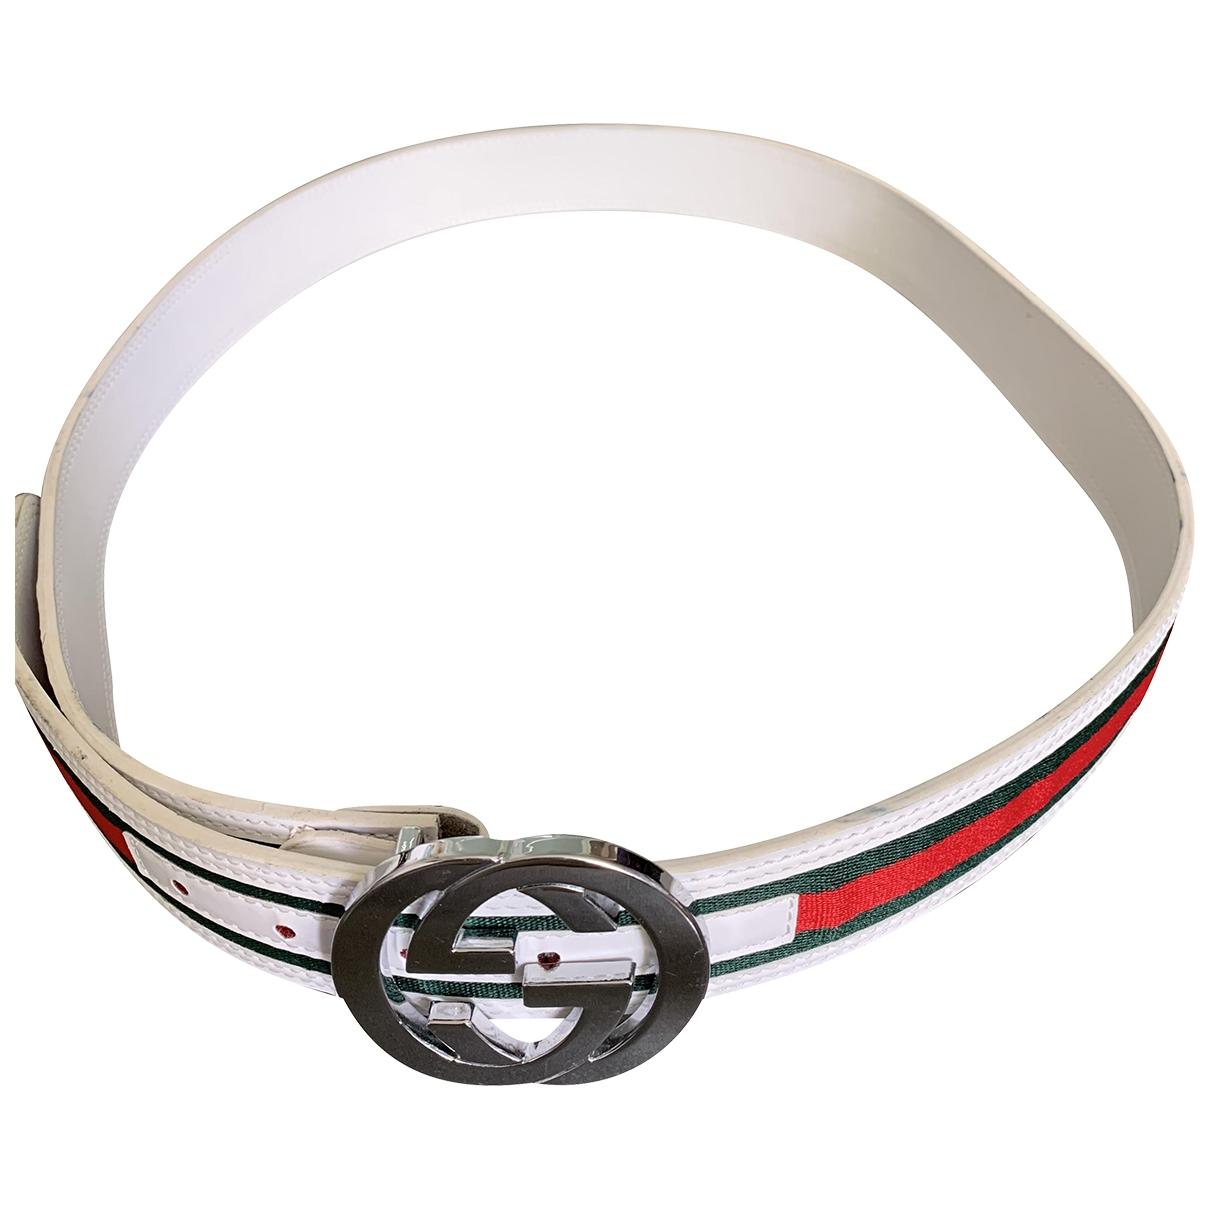 Gucci Interlocking Buckle White Leather belt for Men XL international